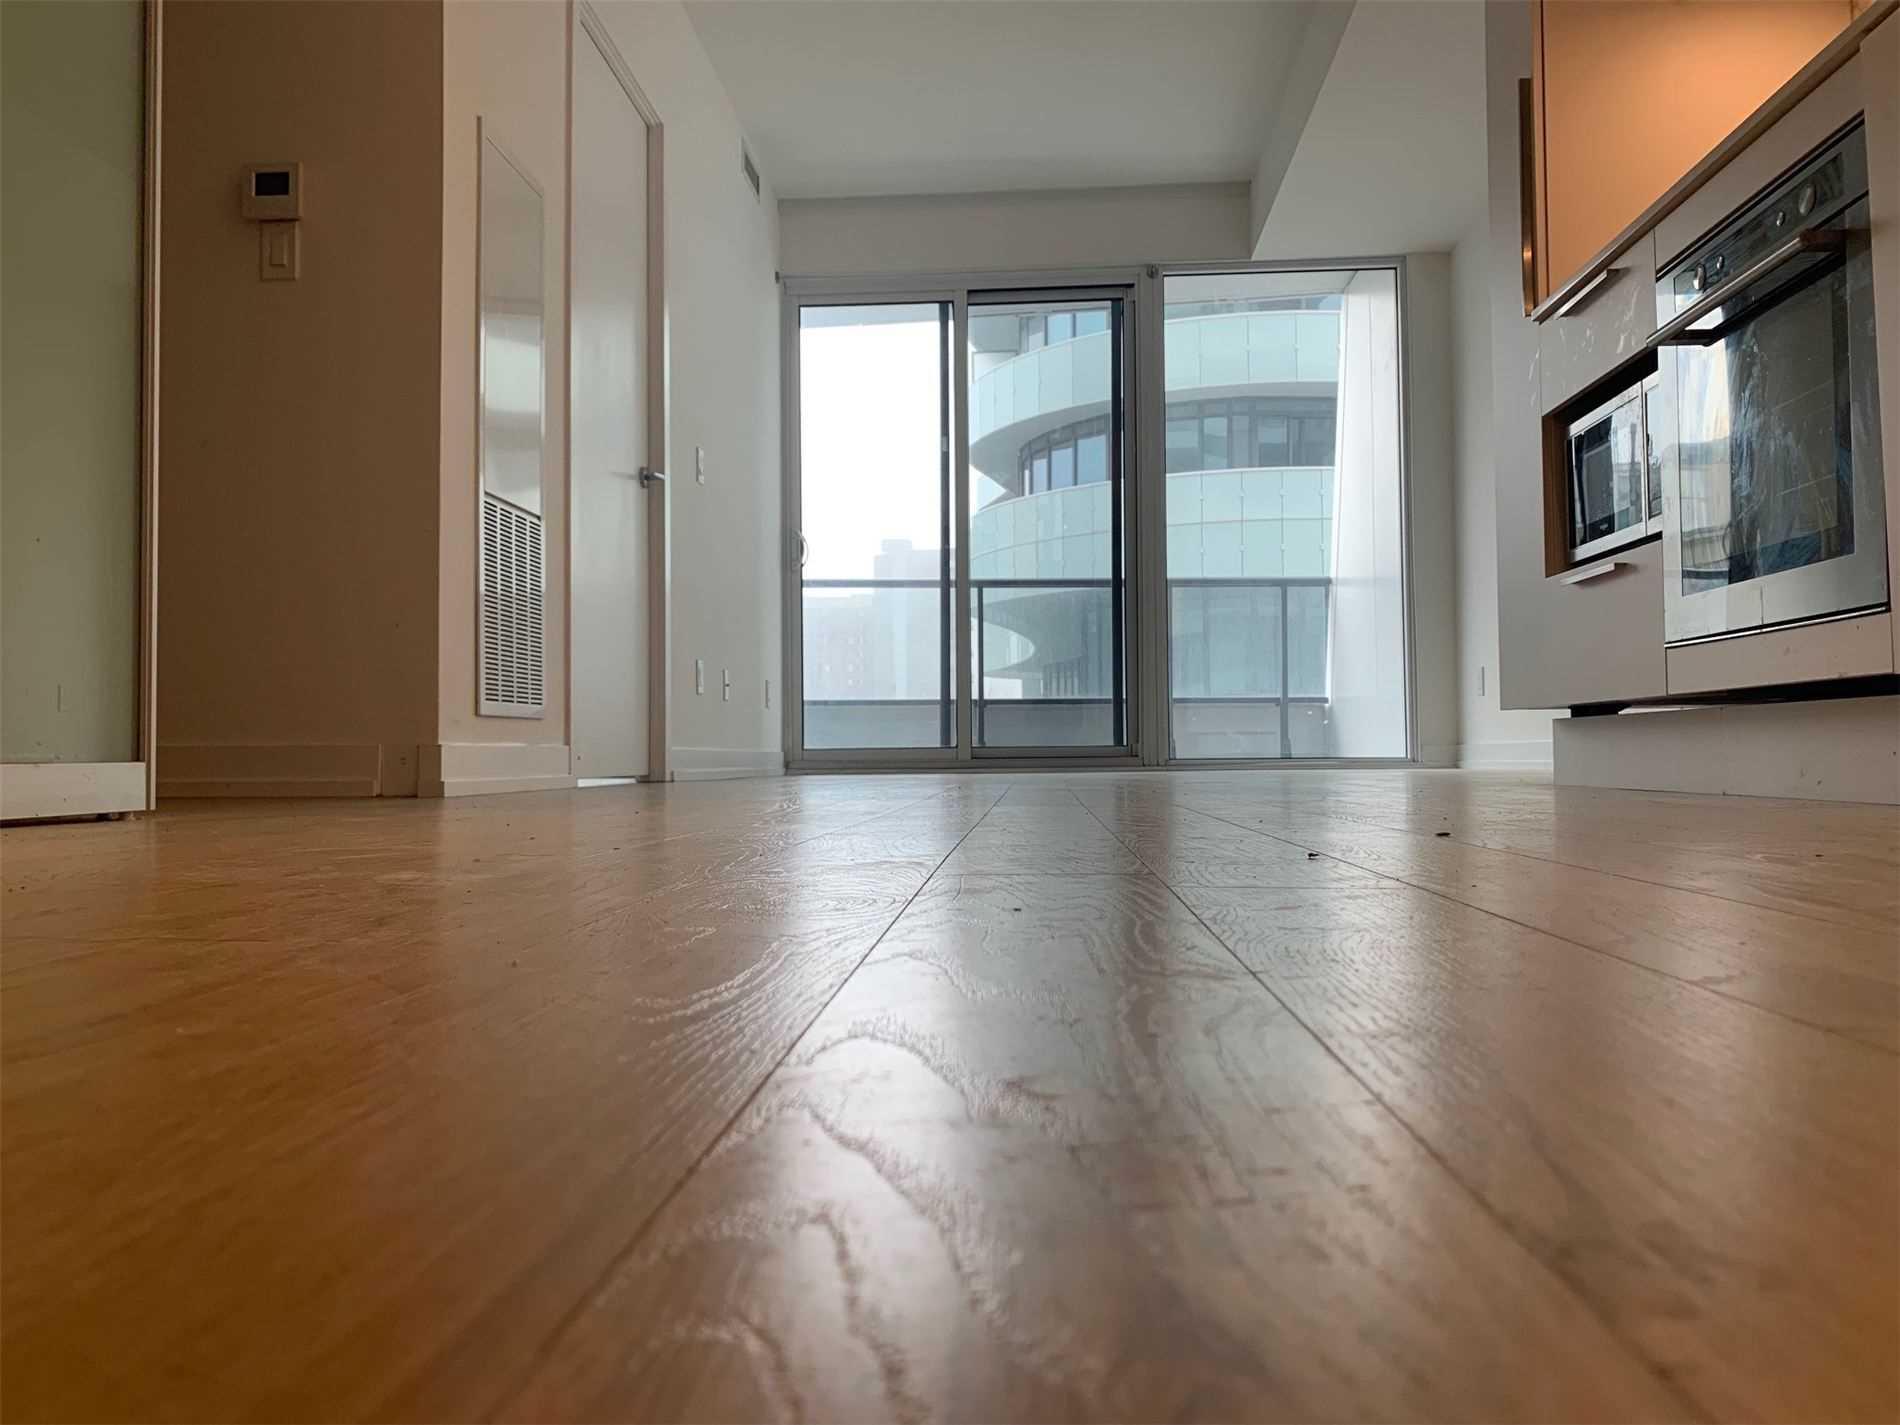 1001 - 85 Wood St - Church-Yonge Corridor Condo Apt for sale, 1 Bedroom (C5221011) - #4